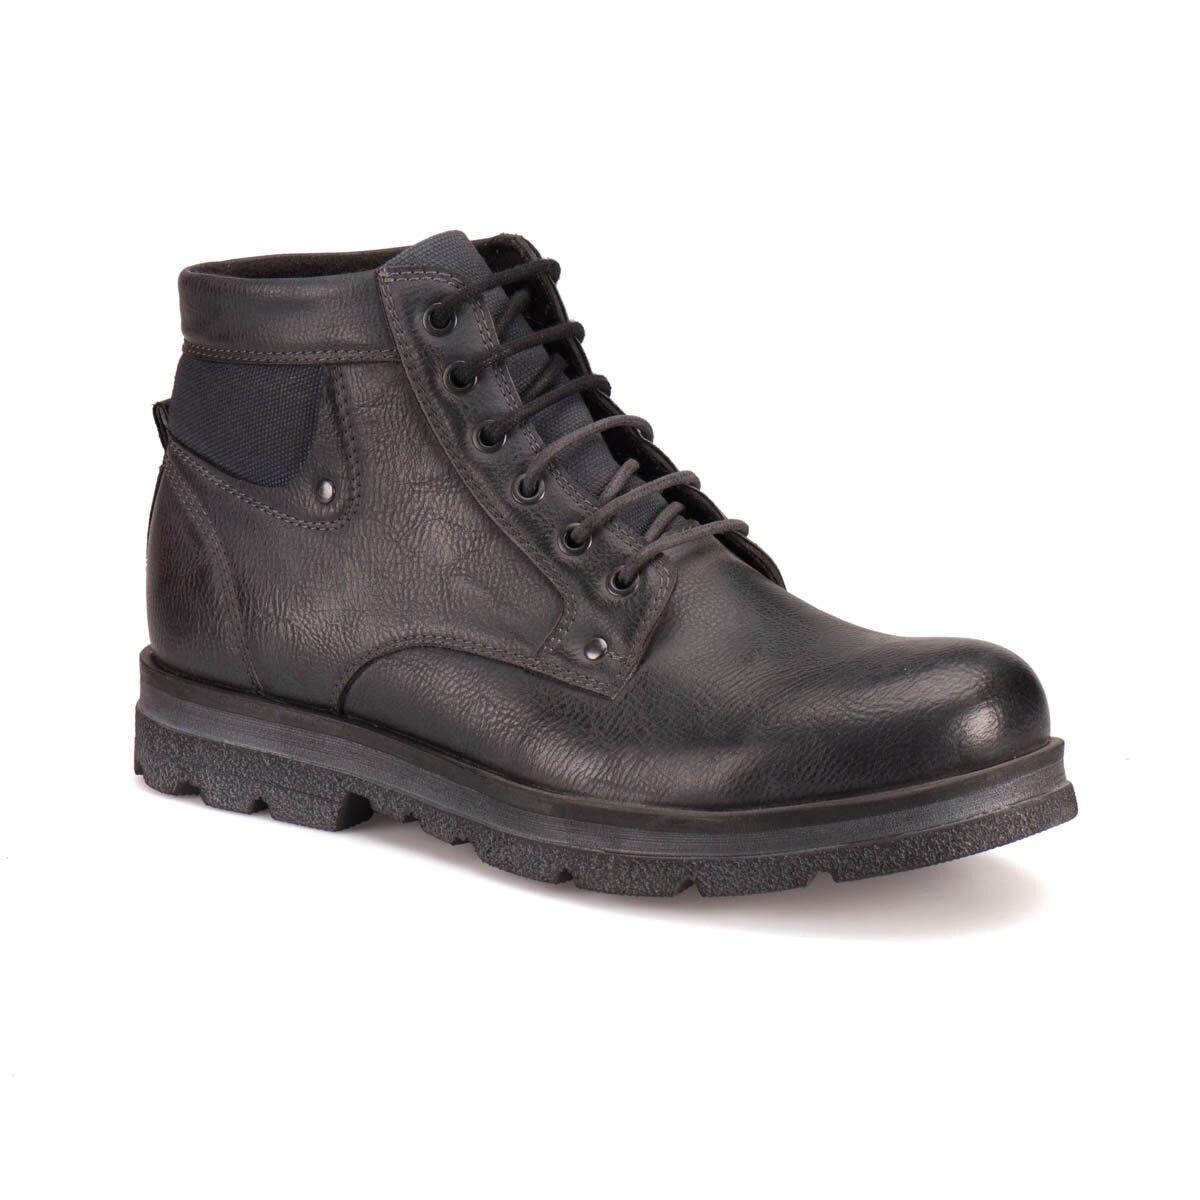 FLO A162000421 Black Men Boots Forester